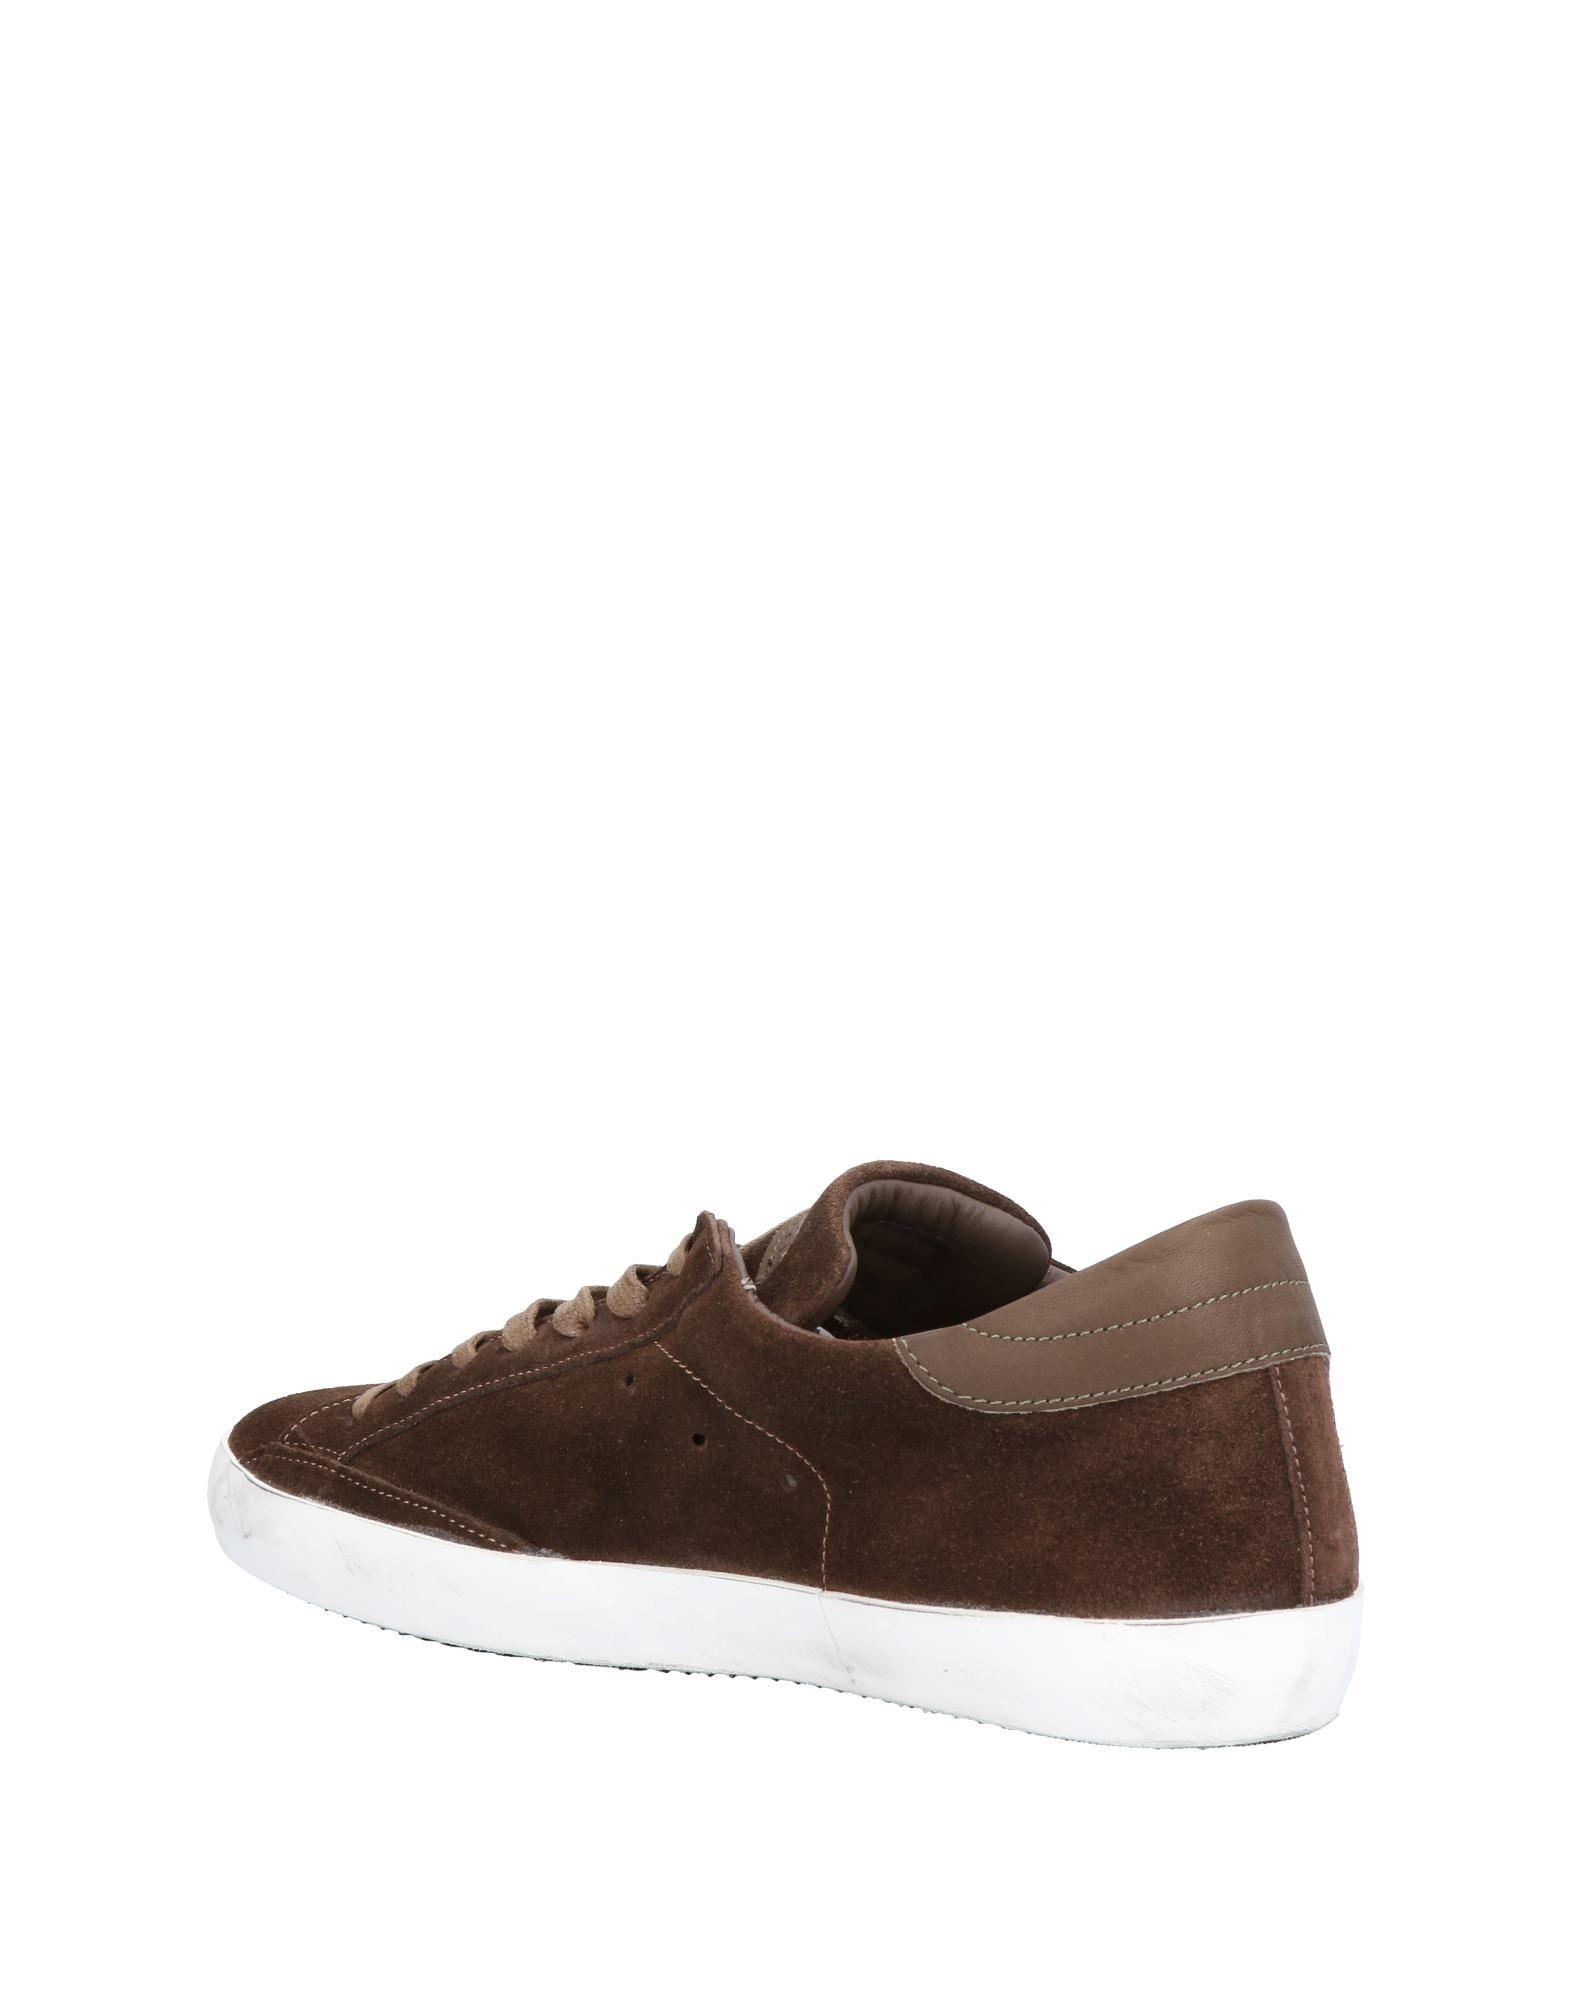 Philippe Model Sneakers Herren  11489277PO Neue Neue 11489277PO Schuhe 39df0f